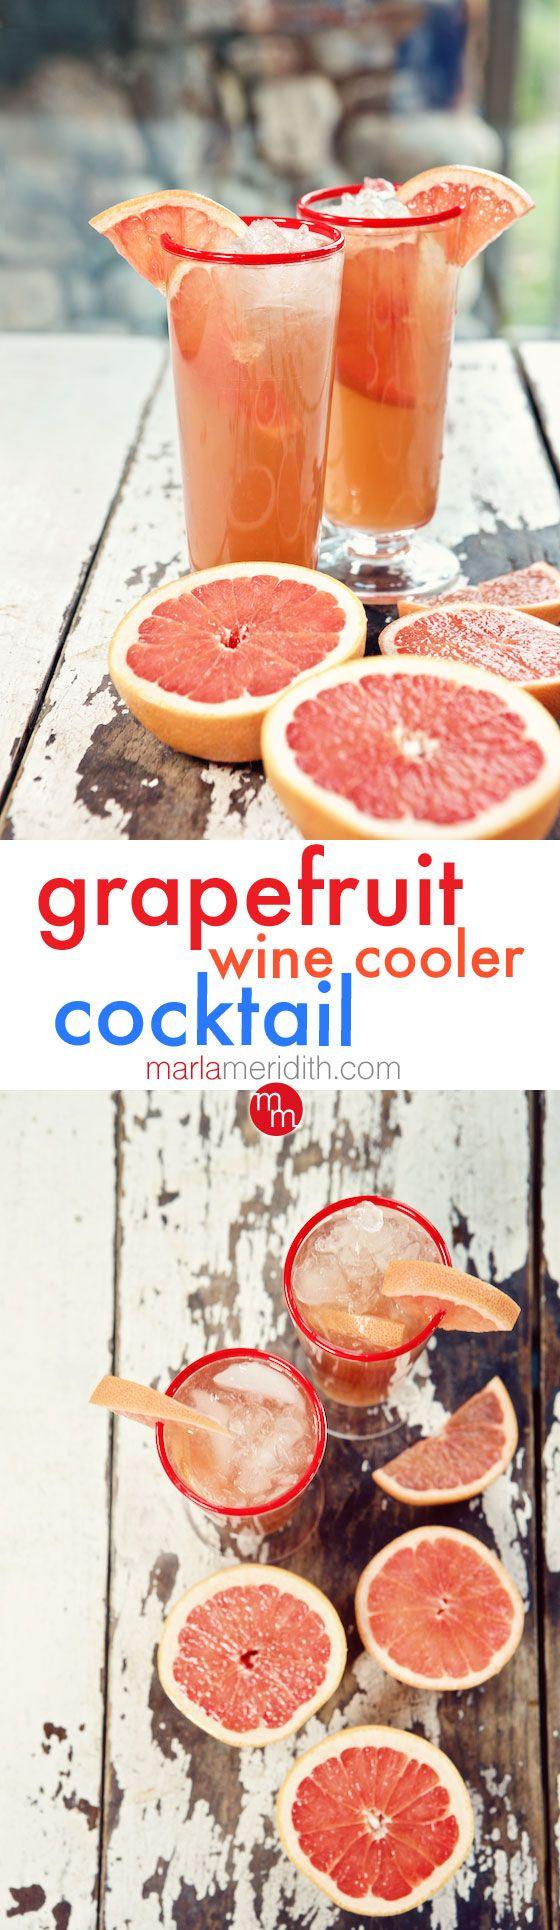 Grapefruit Wine Cooler Cocktail | MarlaMeridith.com ( @marlameridith )